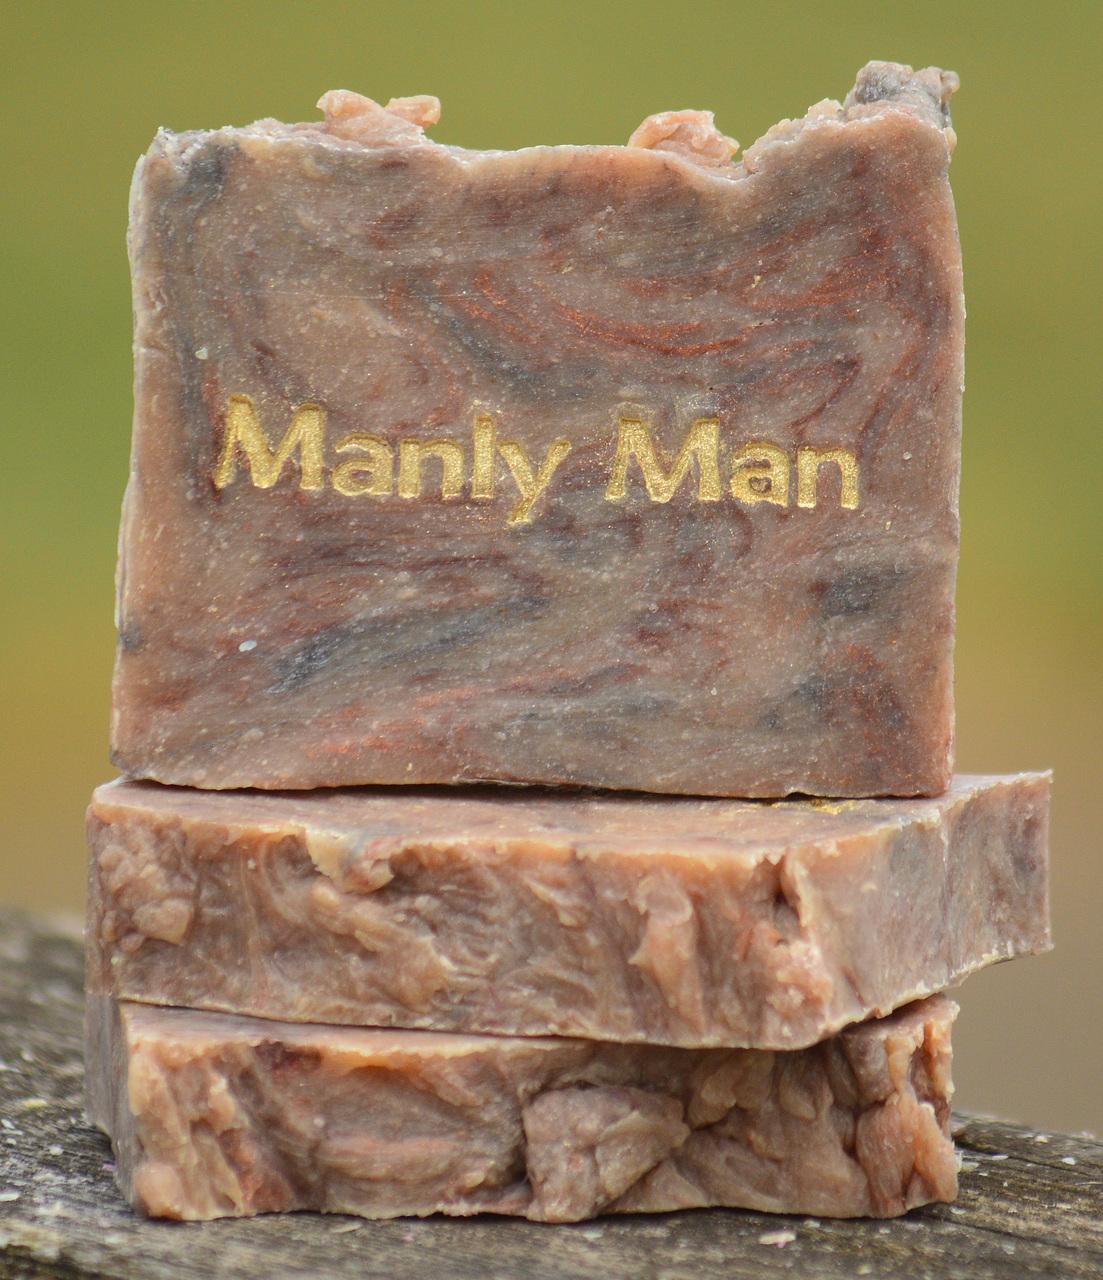 Manly Man Goat Milk Soap Slice